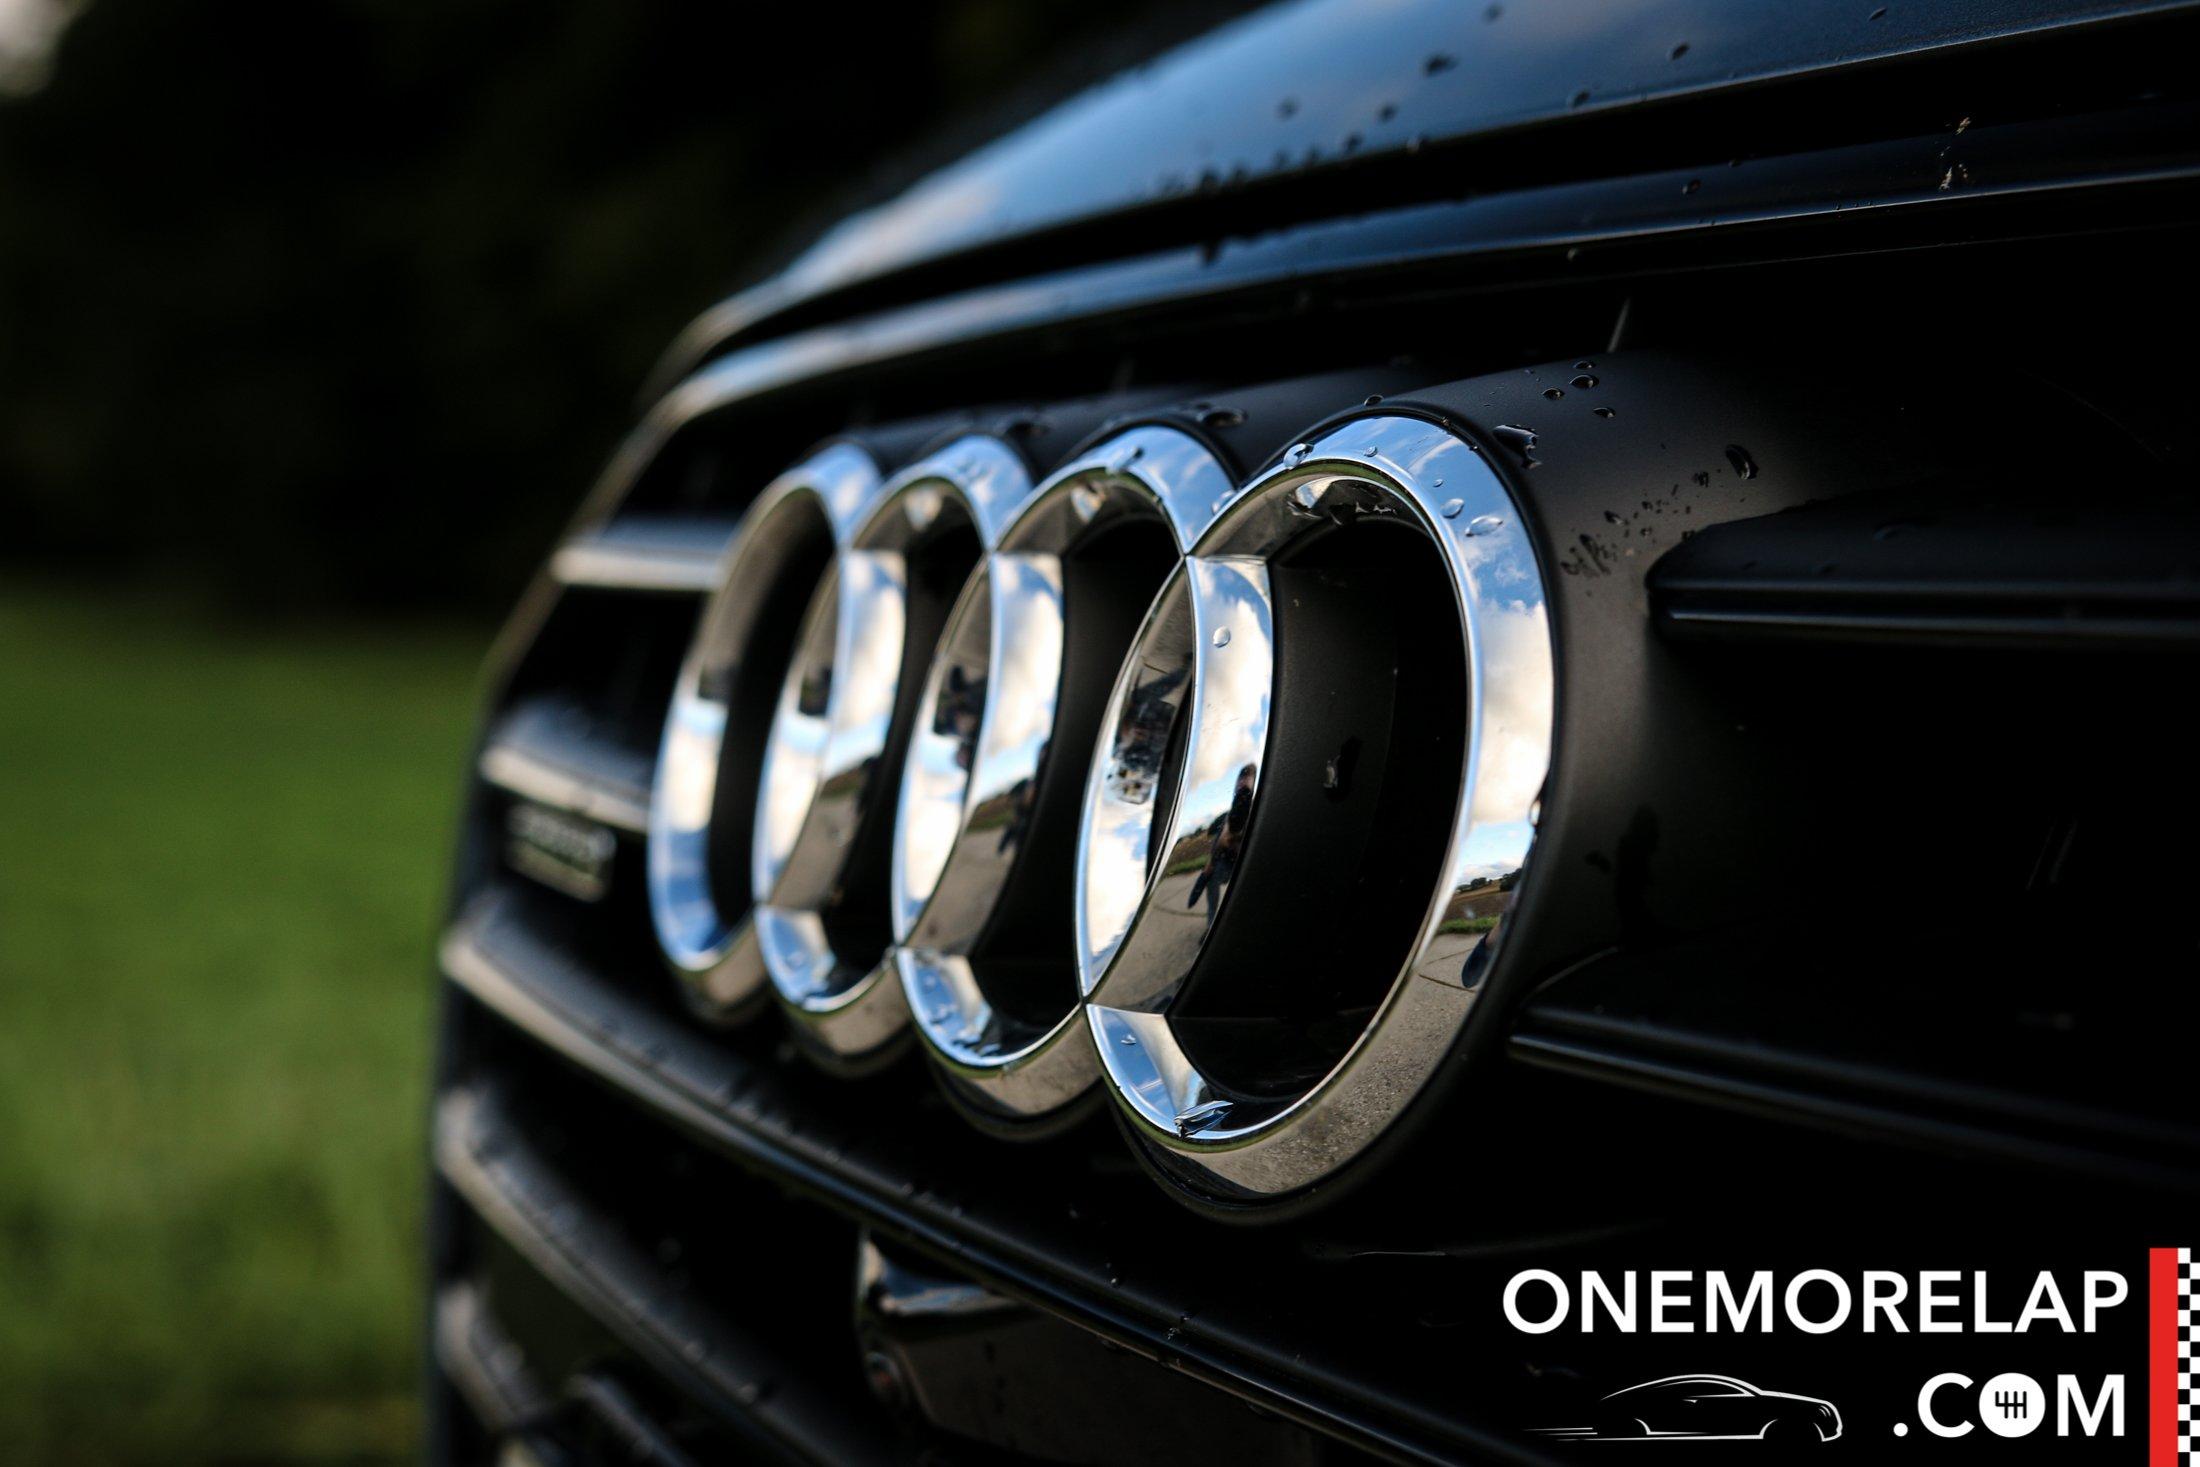 Fahrbericht: Audi A6 C7 Facelift 2015 3.0 TDI Quattro